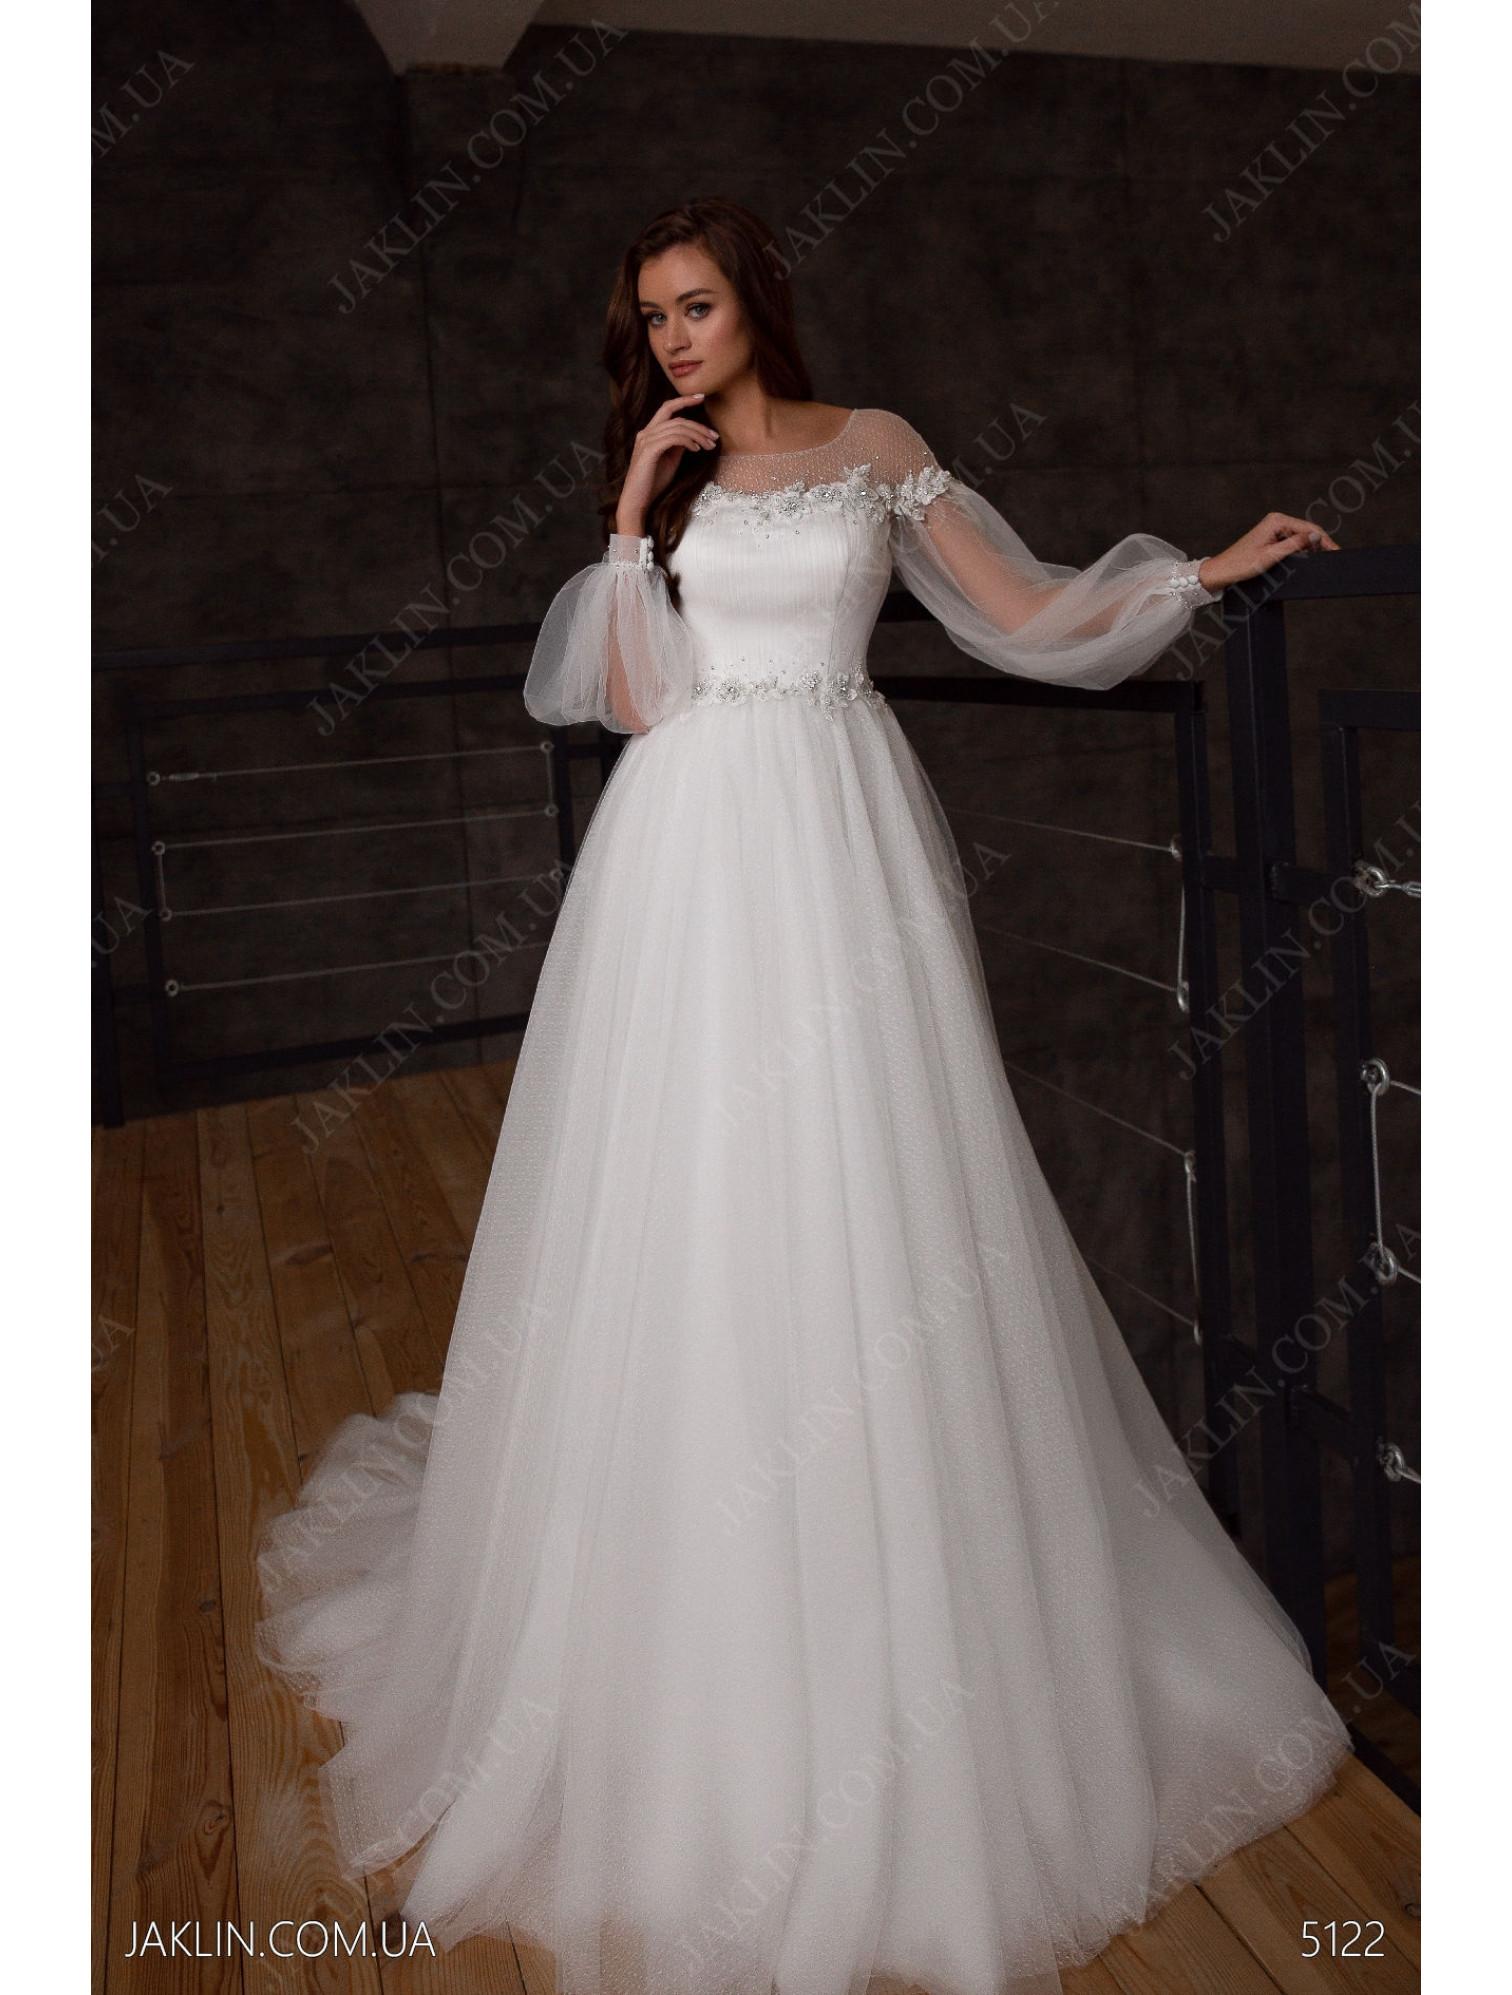 Wedding dress 5122